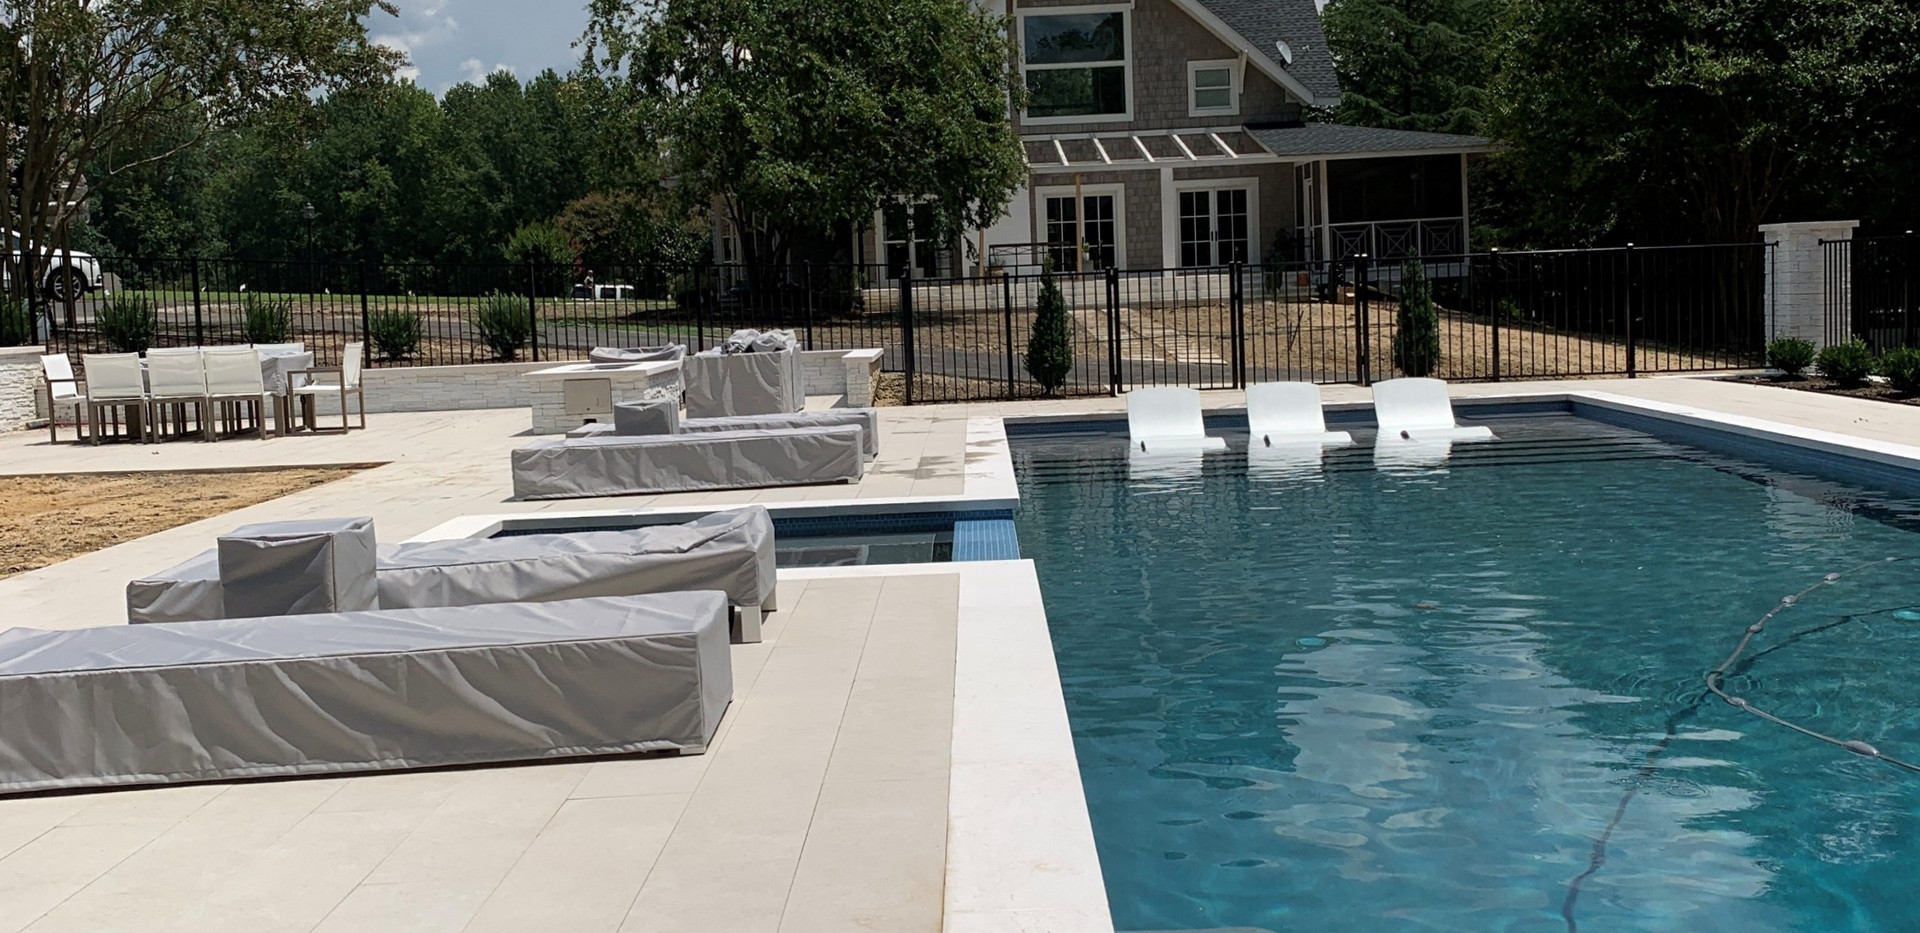 Lowe Residence - Pool Lounge Chair